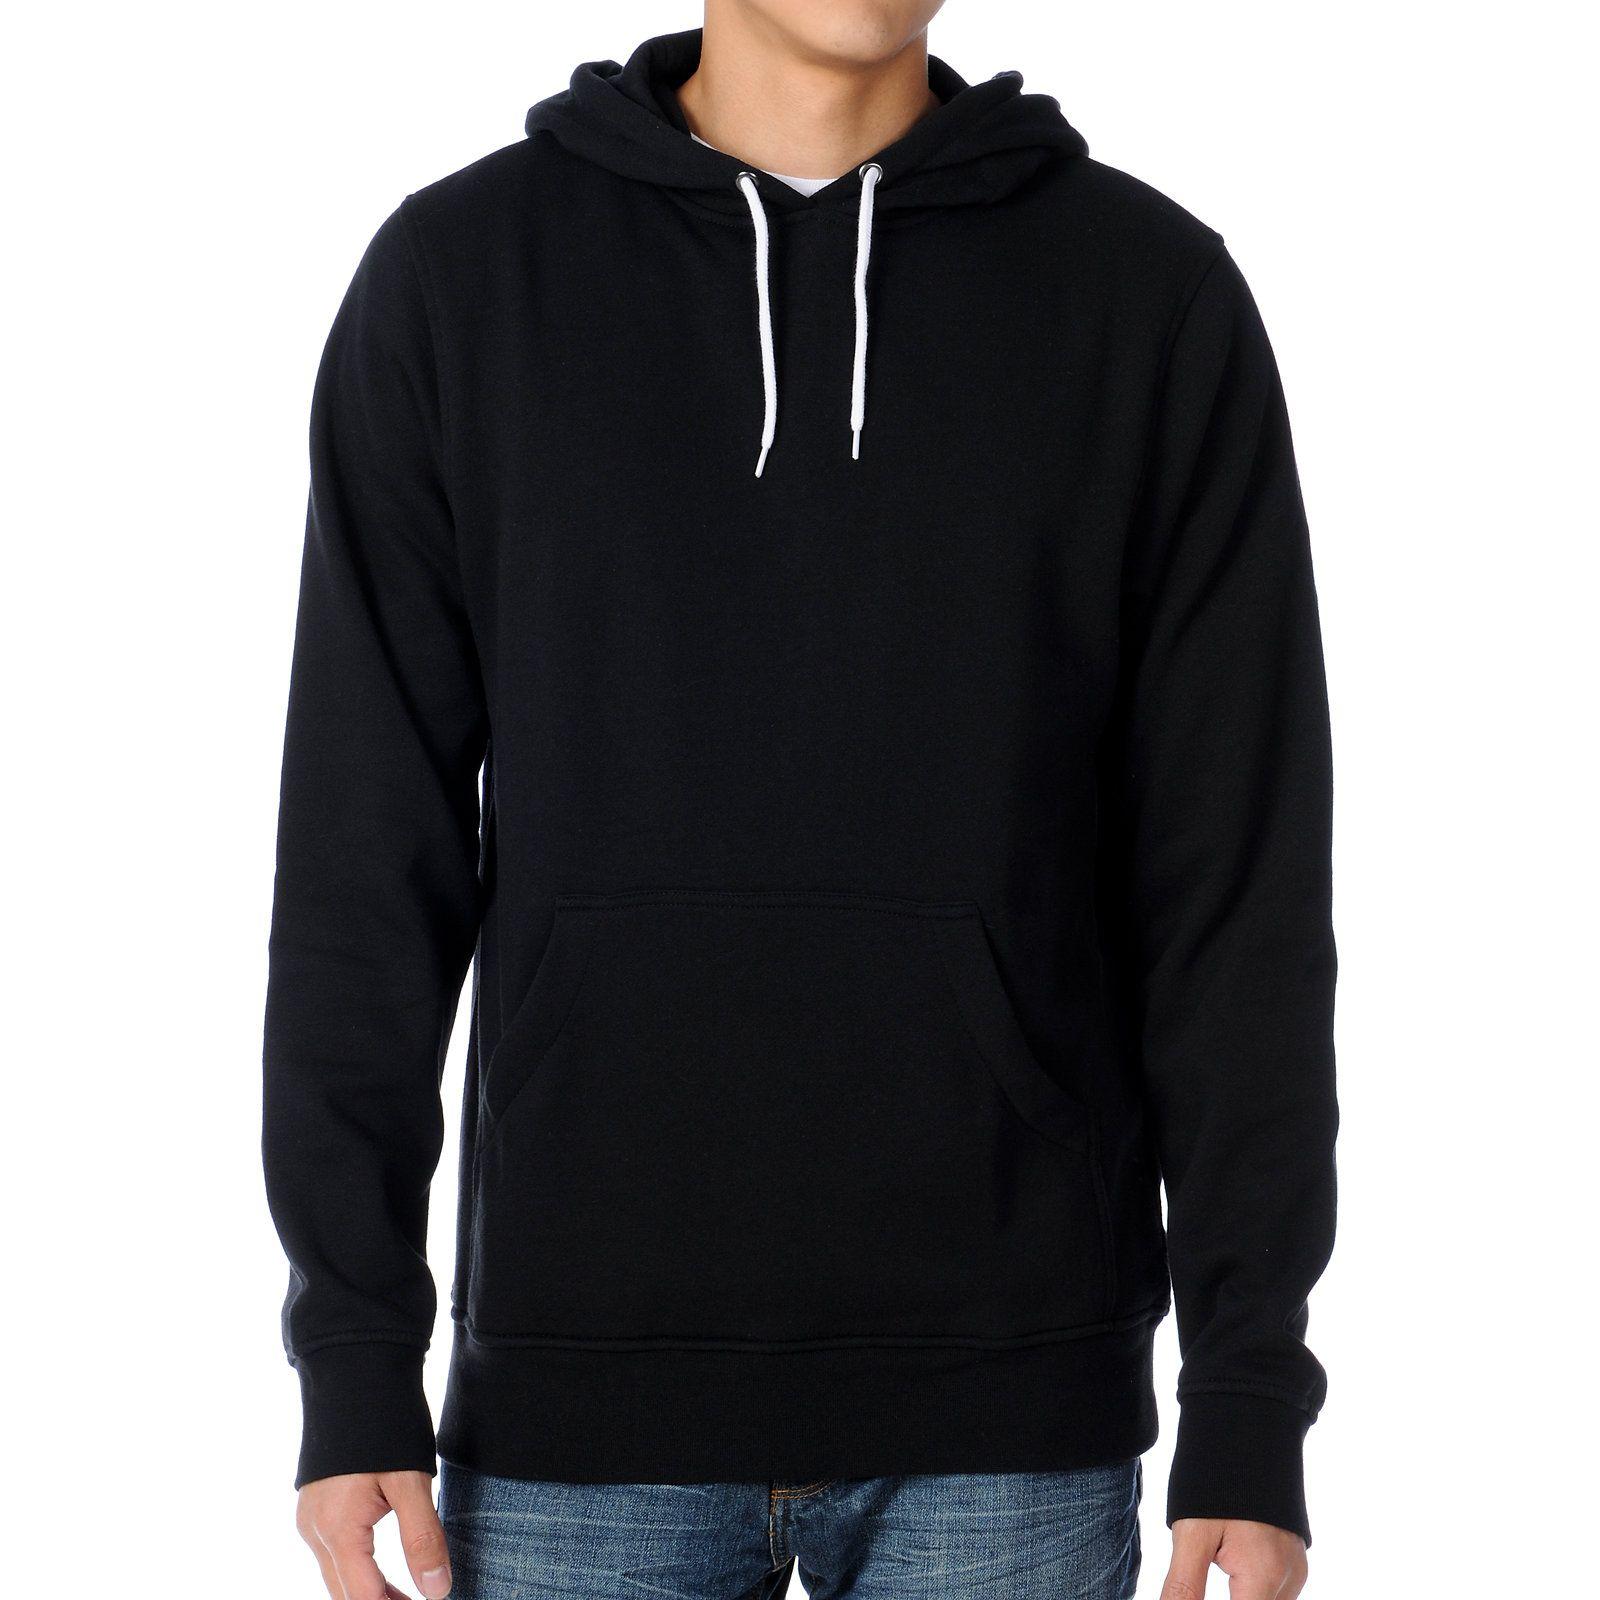 Zine Pulley Solid Black Pullover Hoodie Zumiez Hoodies Black Pullover Hoodie Mens Sweatshirts Hoodie [ 1600 x 1600 Pixel ]